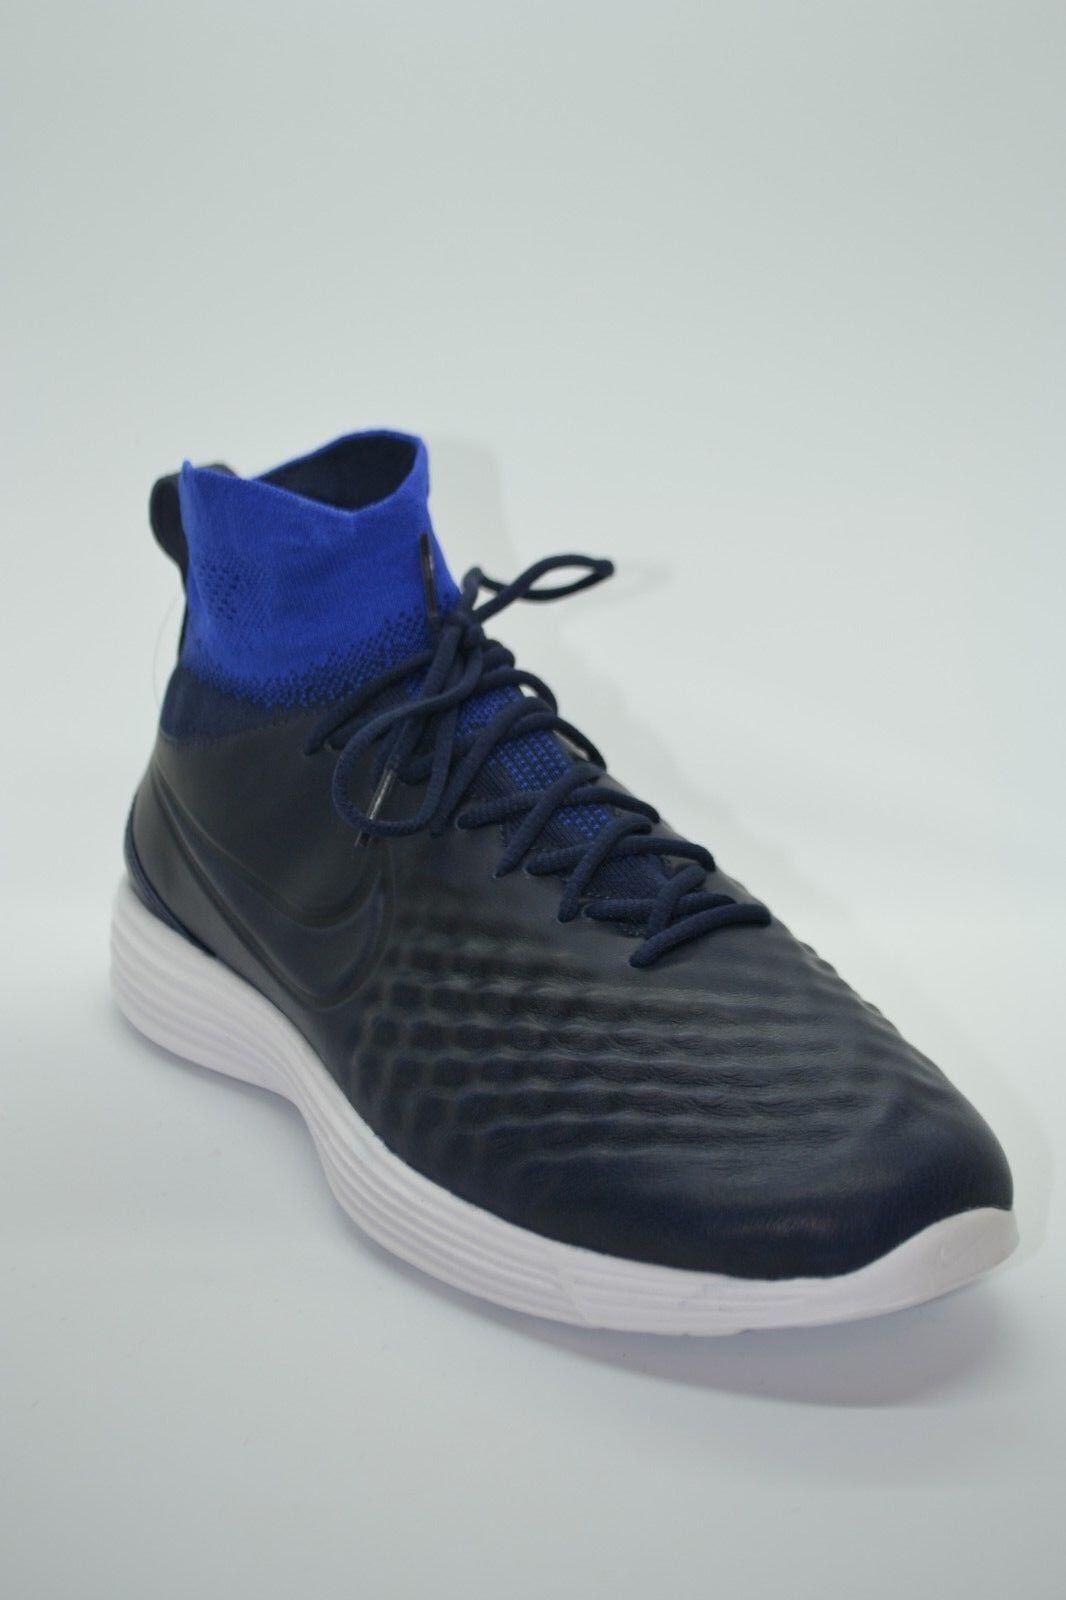 Nike Lunar magista 9,5 II Flyknit zapatos talla 9,5 magista 20078a